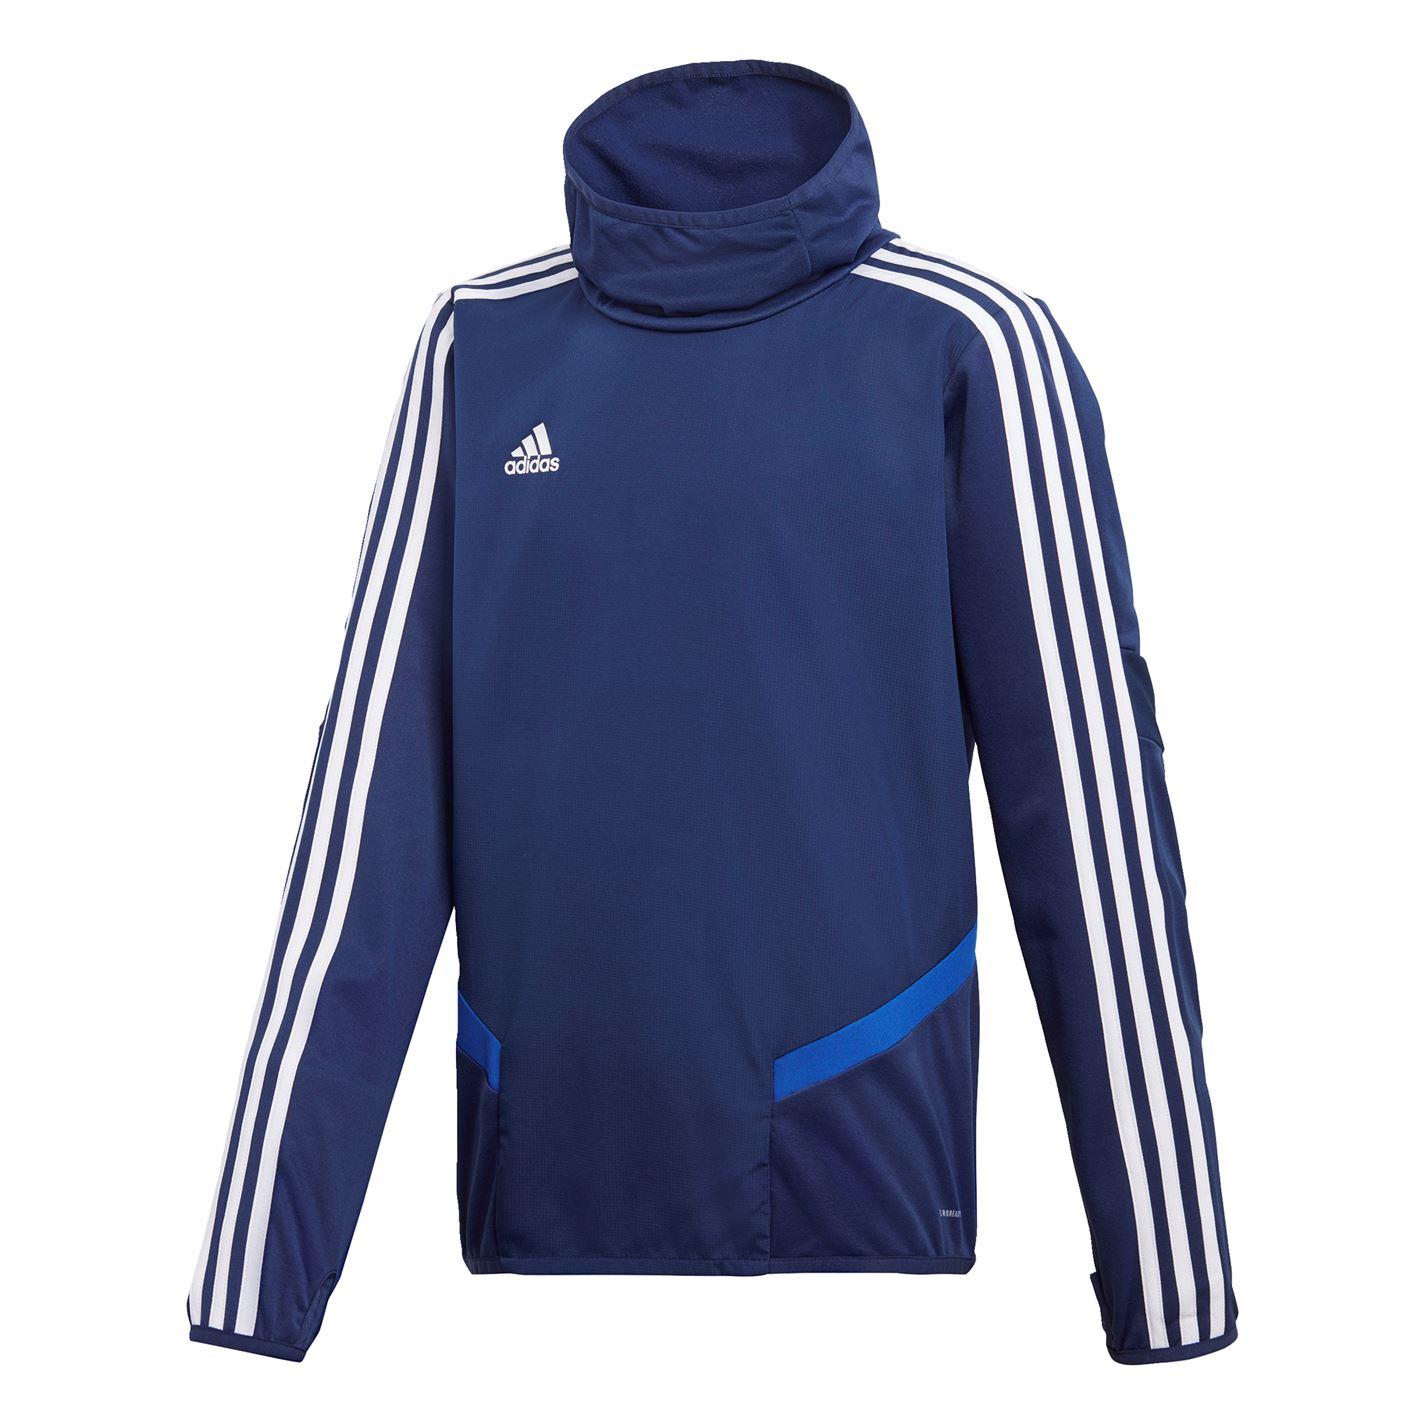 Adidas Tiro 19 Warm Top Child Boys